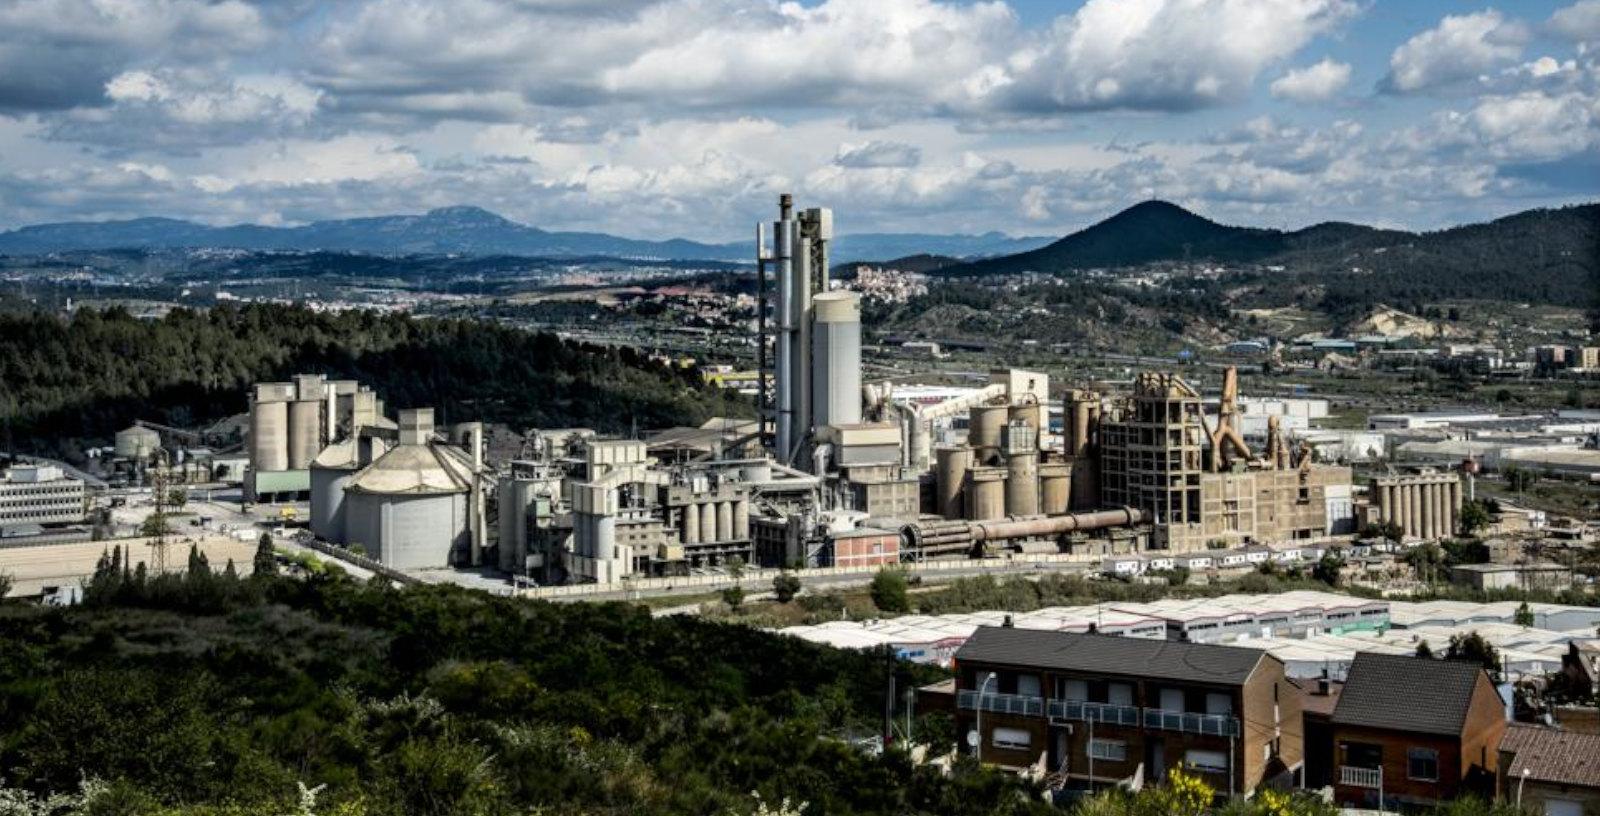 Engineering_Services_Spain_Cementos_Molins_IDOM